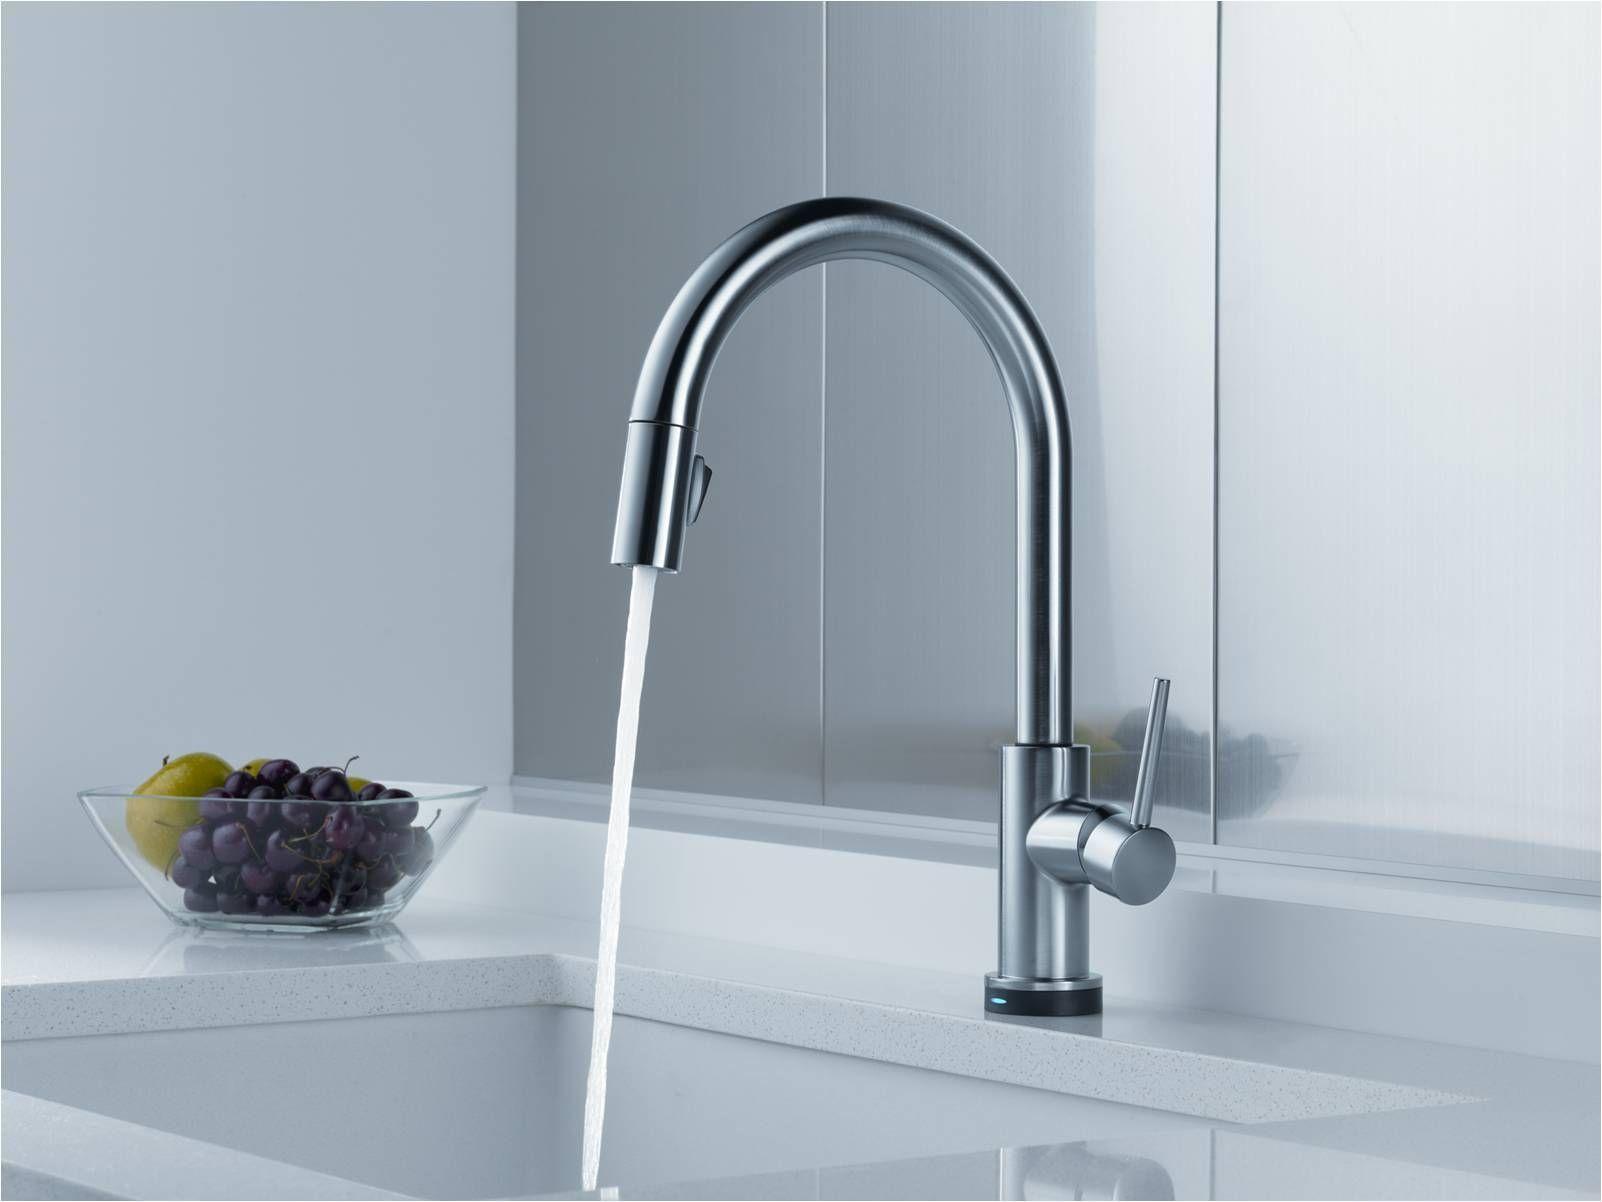 Moen One Touch Elektronische Armatur Kuche Wasserhahn Bad Dusche Armaturen Nicht Beruhren Bad Modern Kitchen Faucet Touch Kitchen Faucet Kitchen Faucet Design